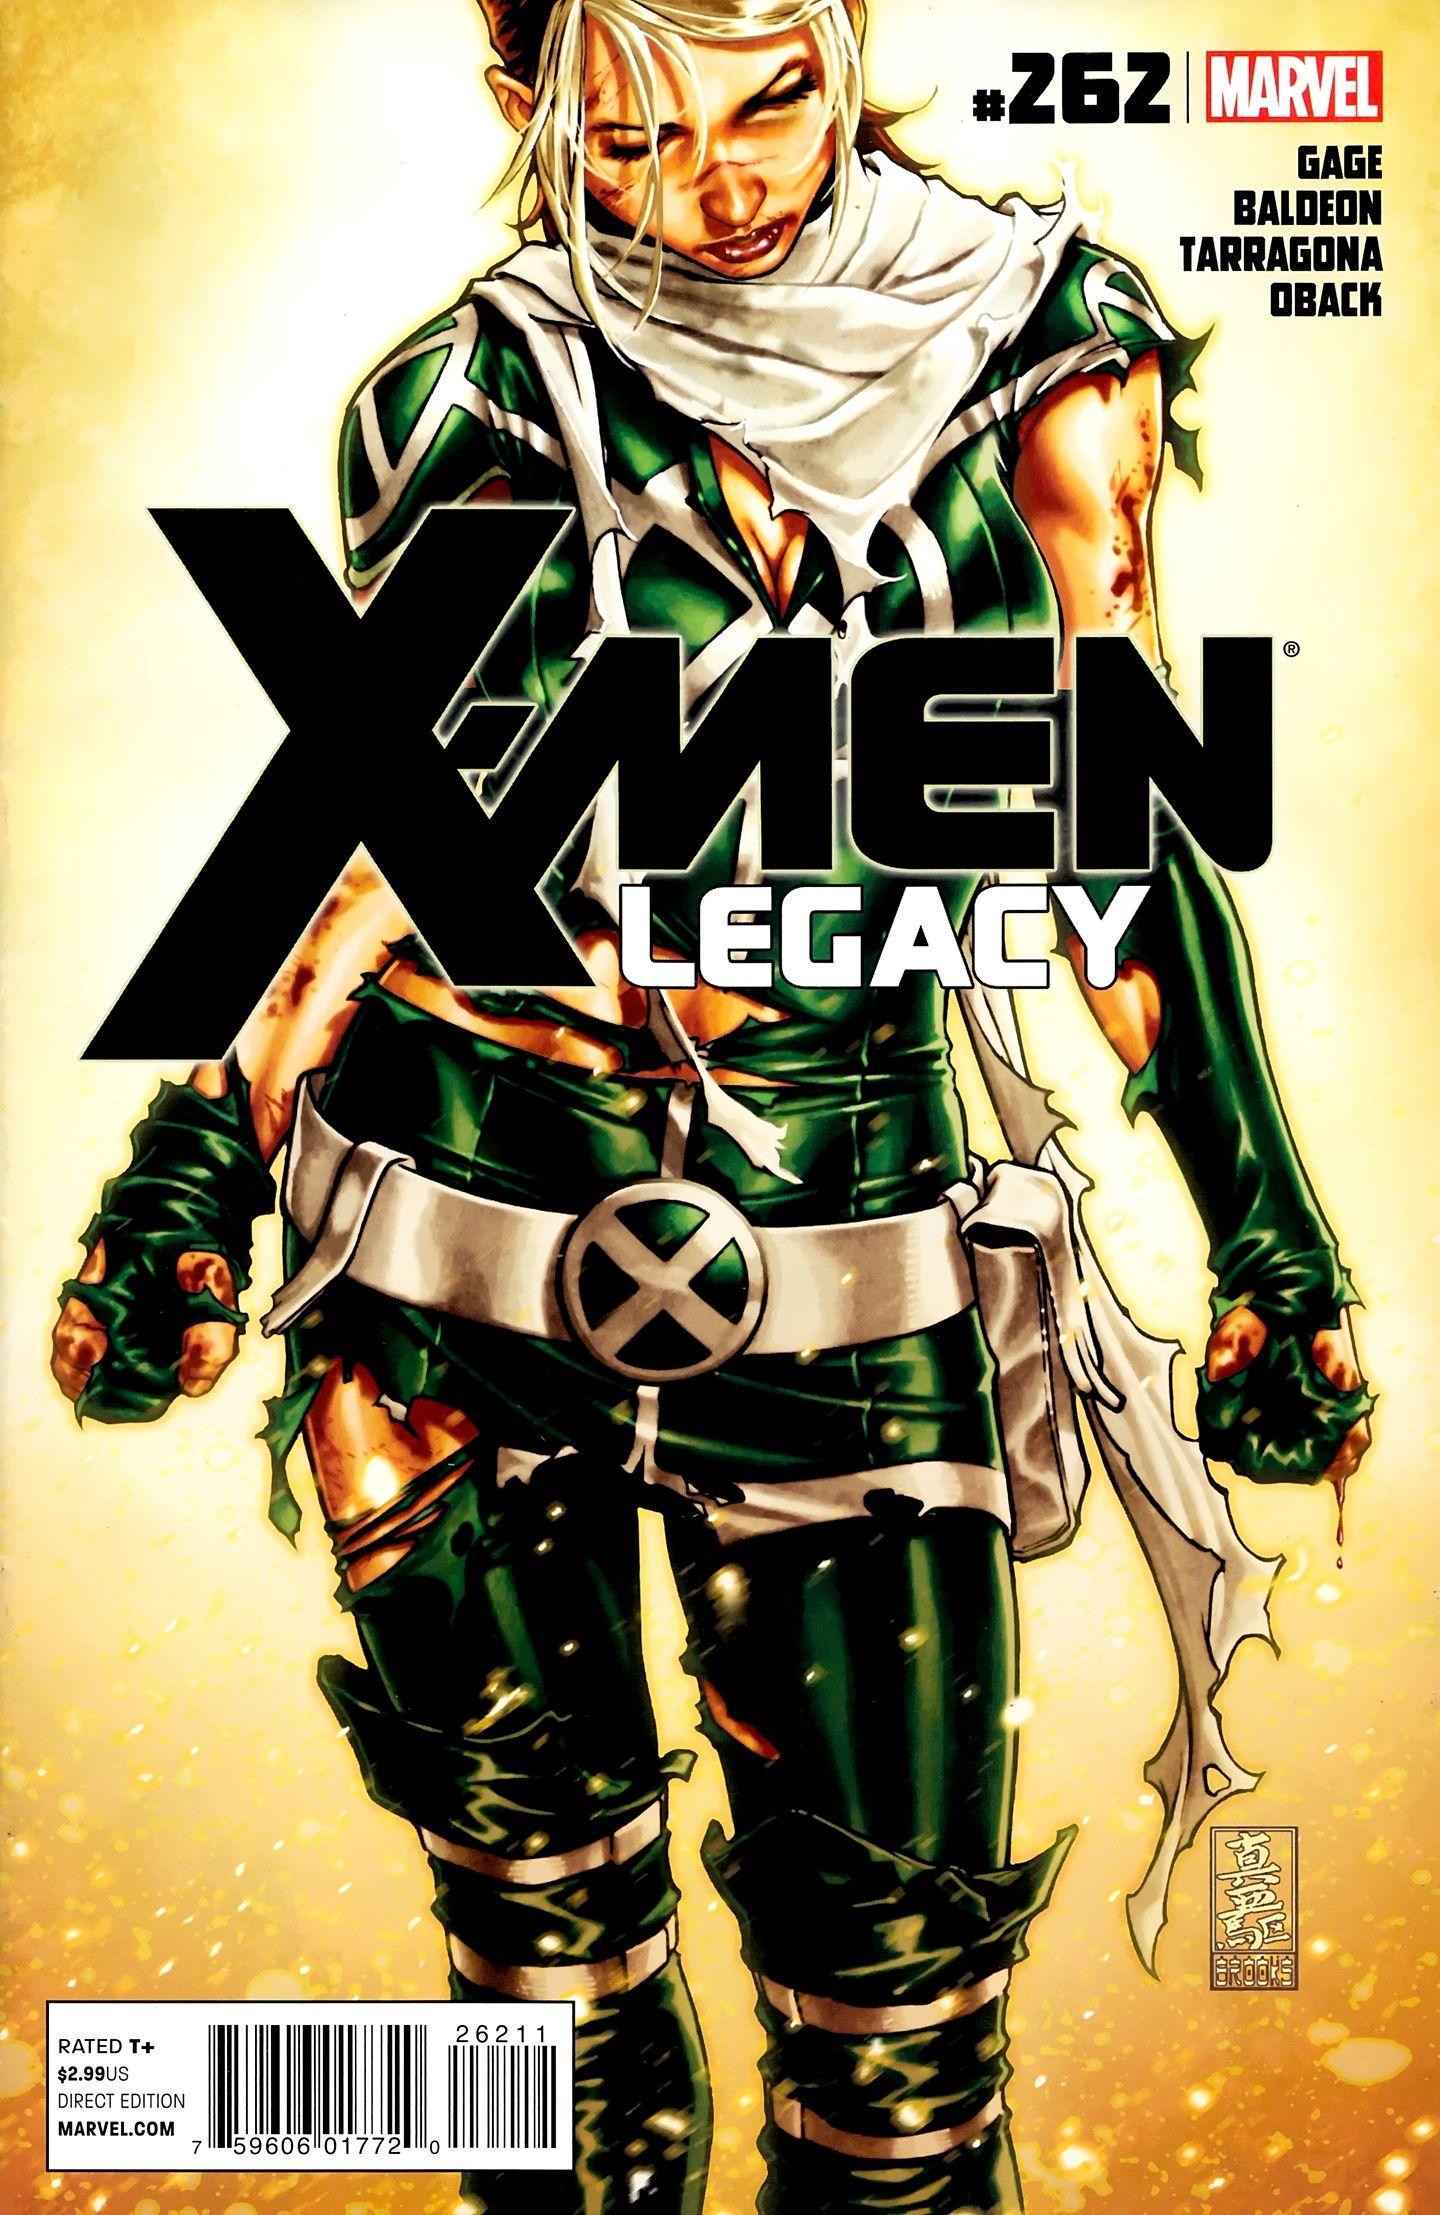 X Men Legacy Vol 1 262 Cover Art By Mark Brooks Marvel Rogue Comics Girls